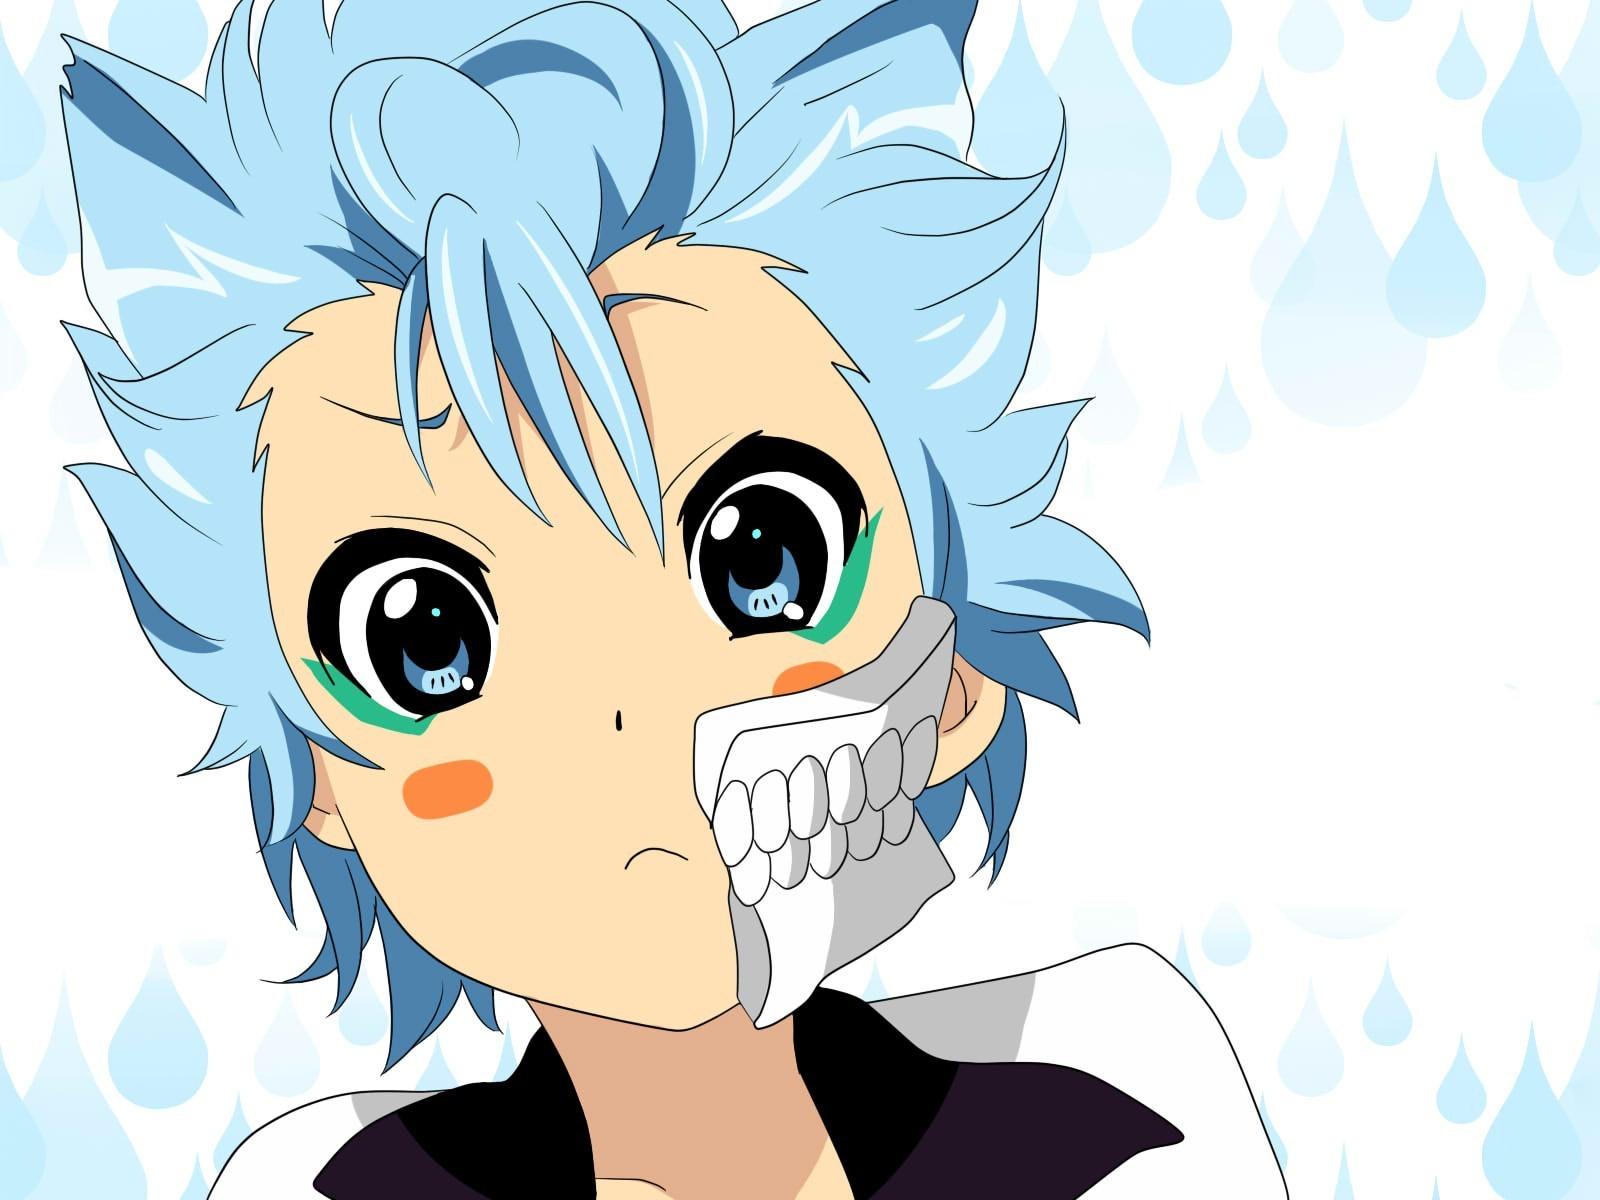 Illustration anime blue hair anime boys chibi line art cartoon bleach 1600x1200 px mangaka